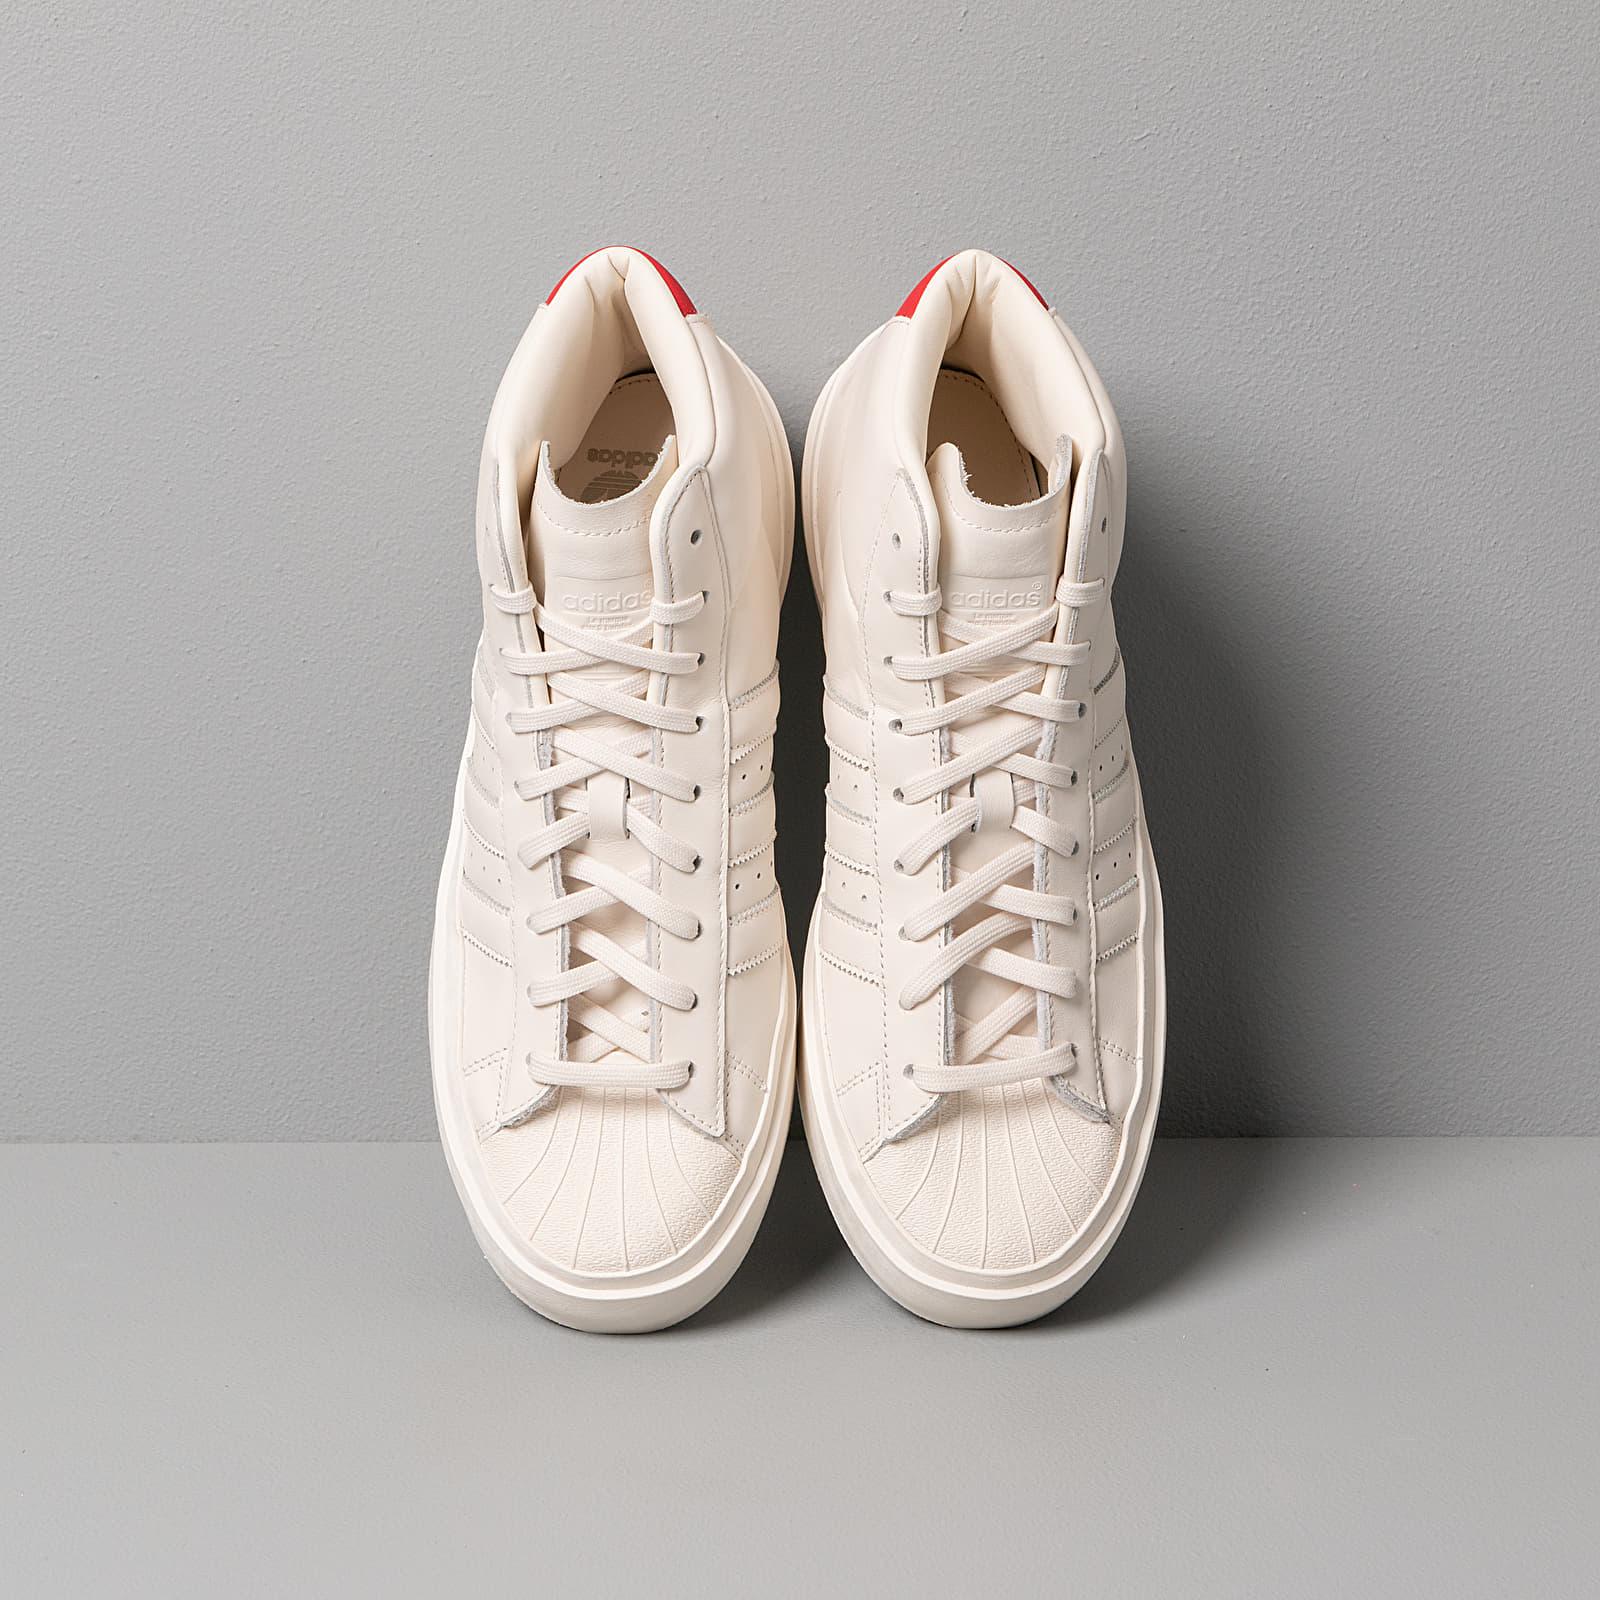 adidas x 424 Pro ModelCore White Core White Core White